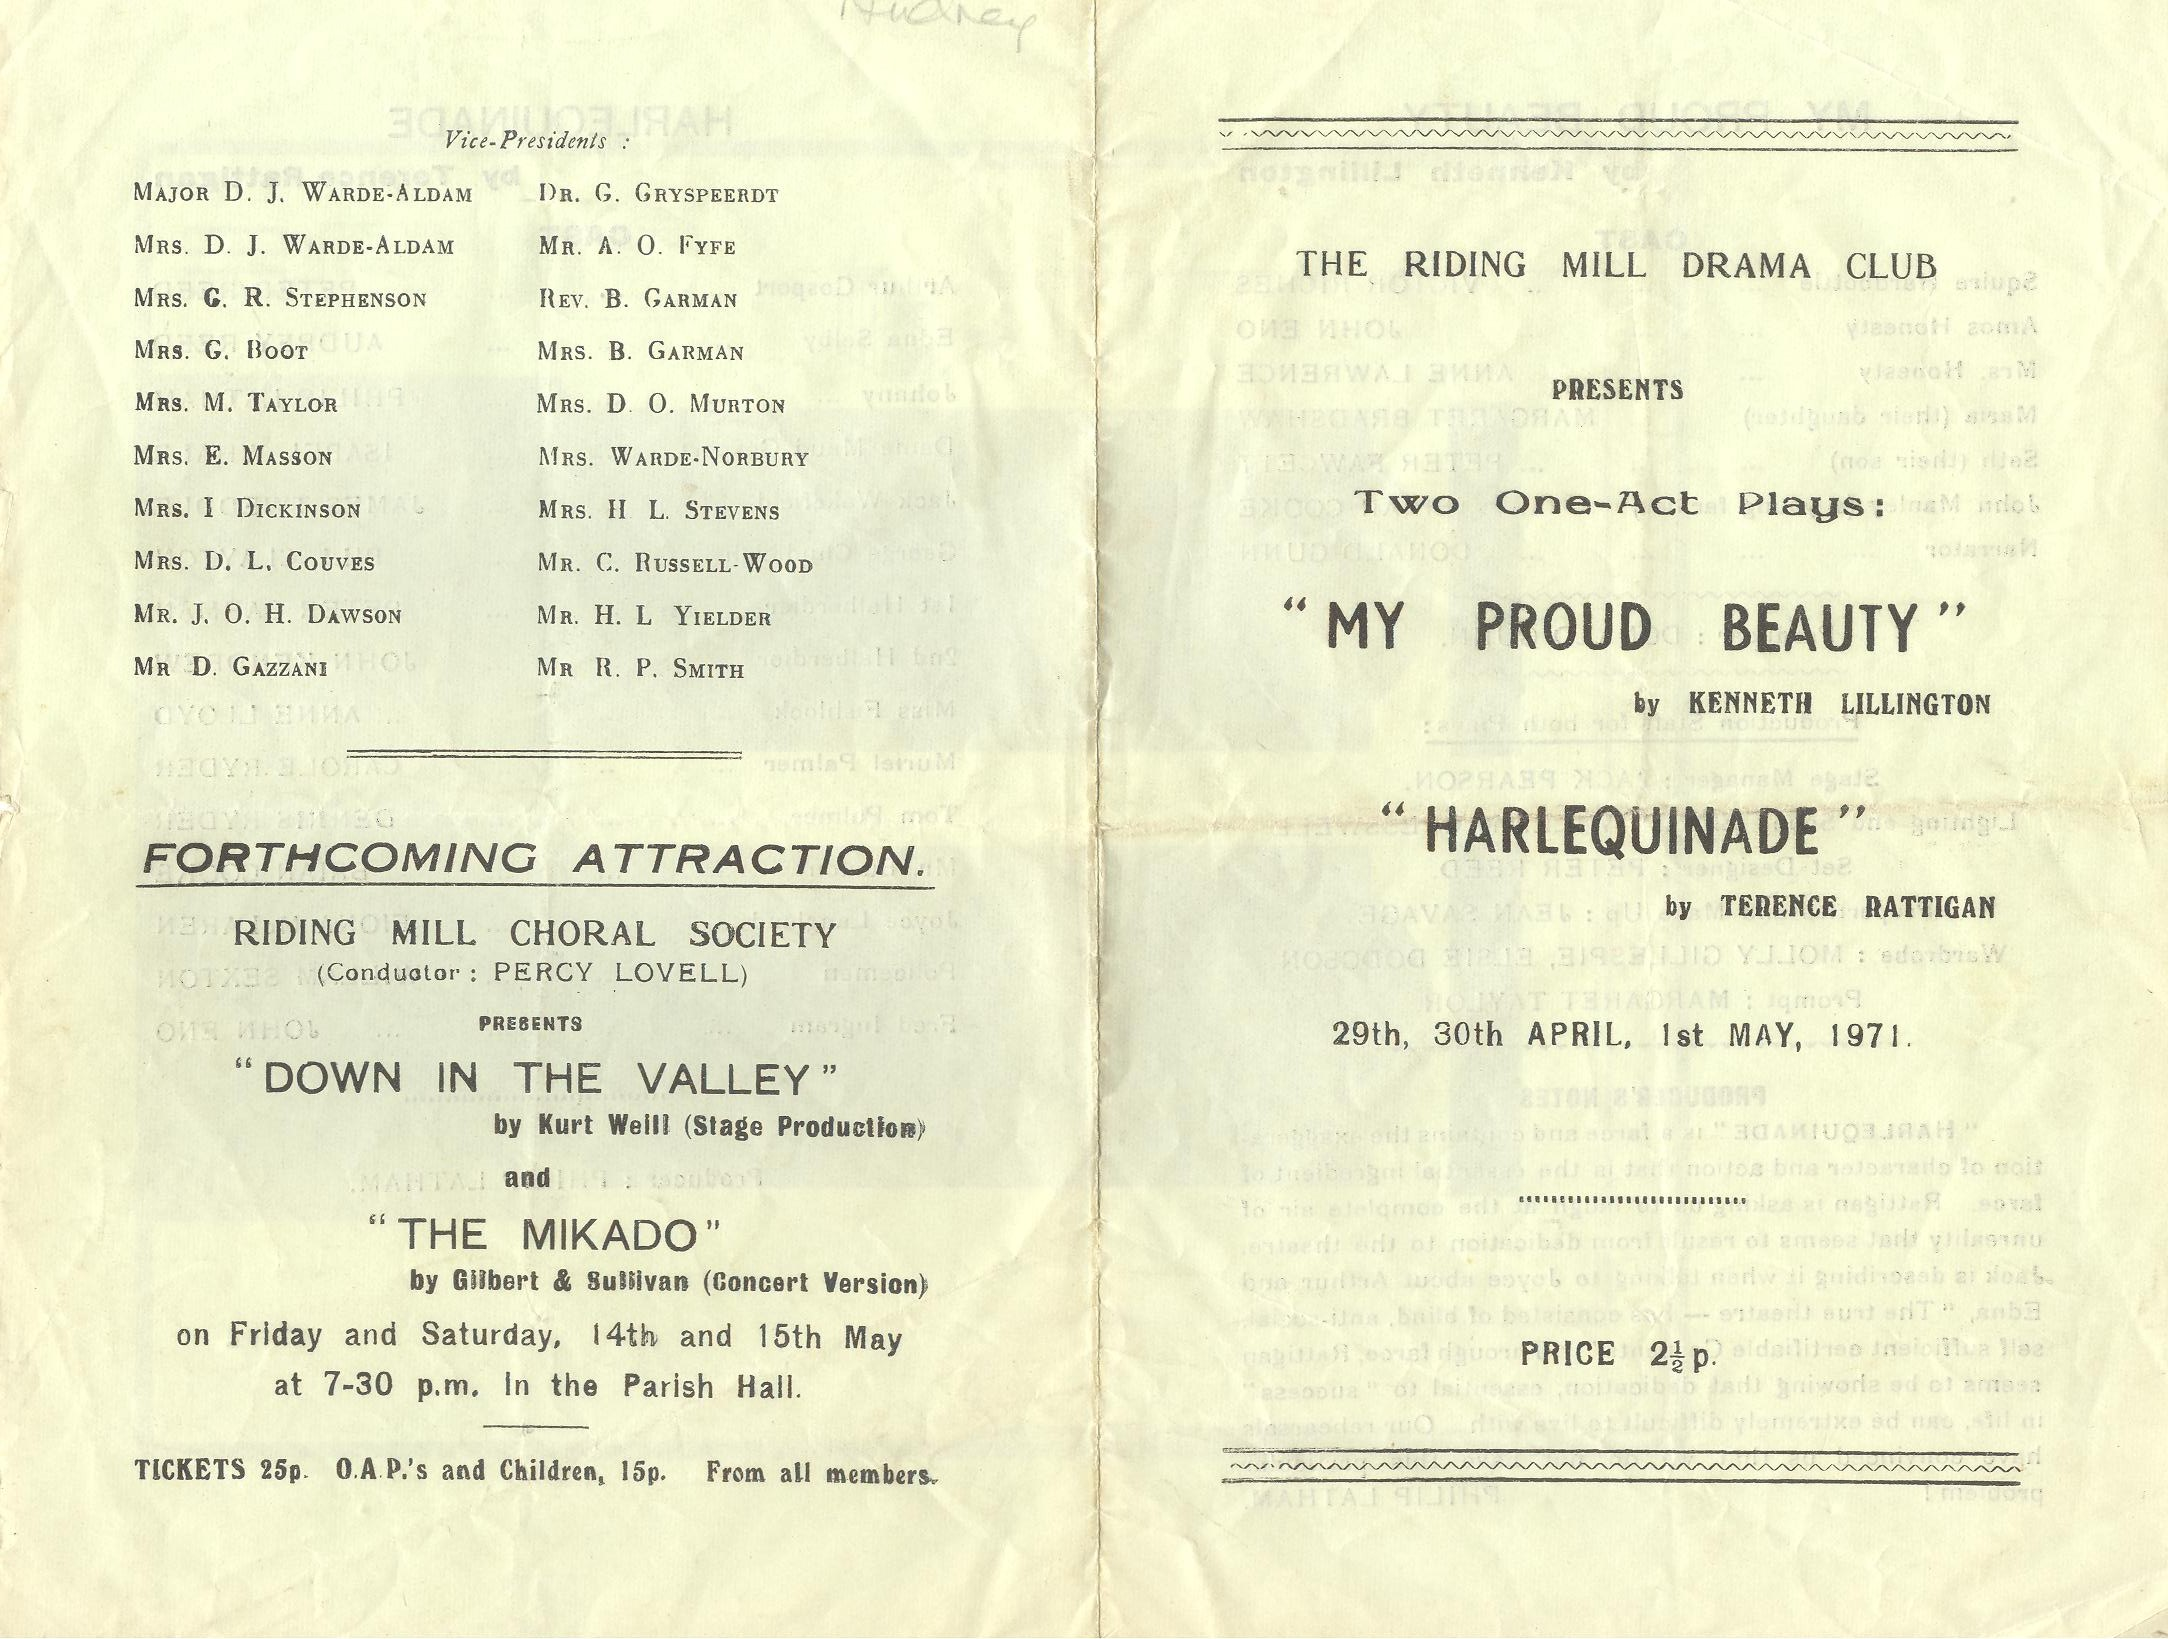 1971 Riding Mill Drama Club, My Proud Be